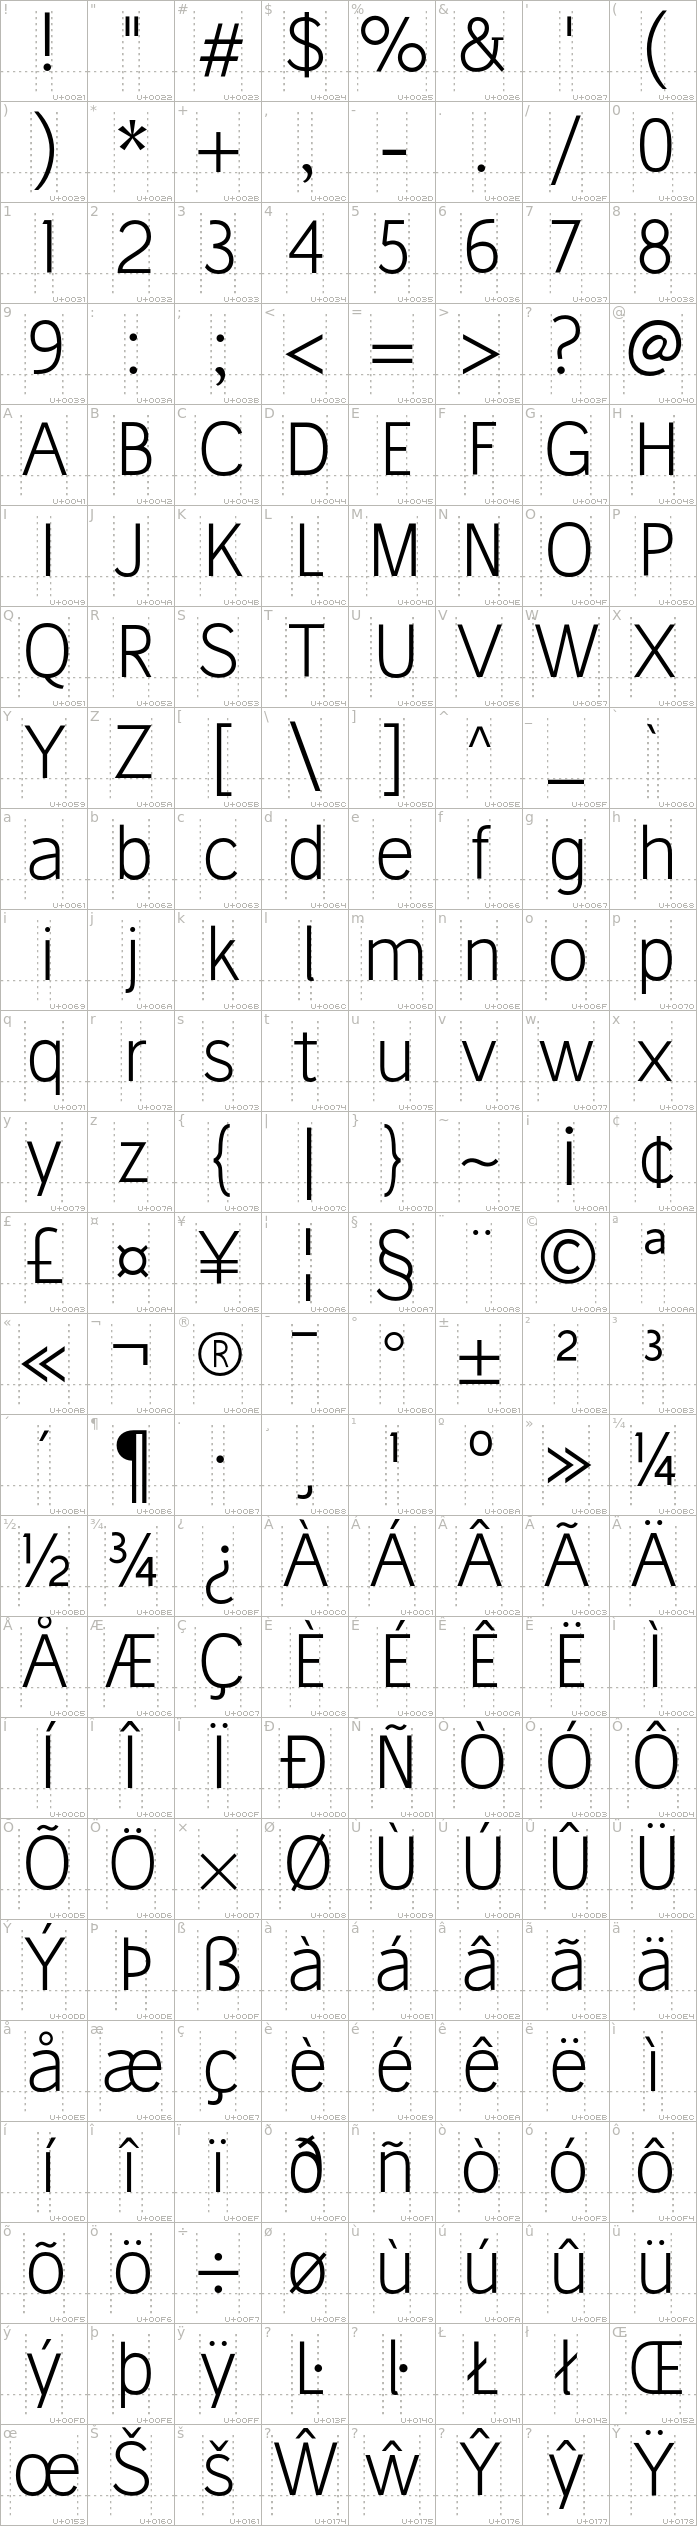 stilu.light.character-map-1